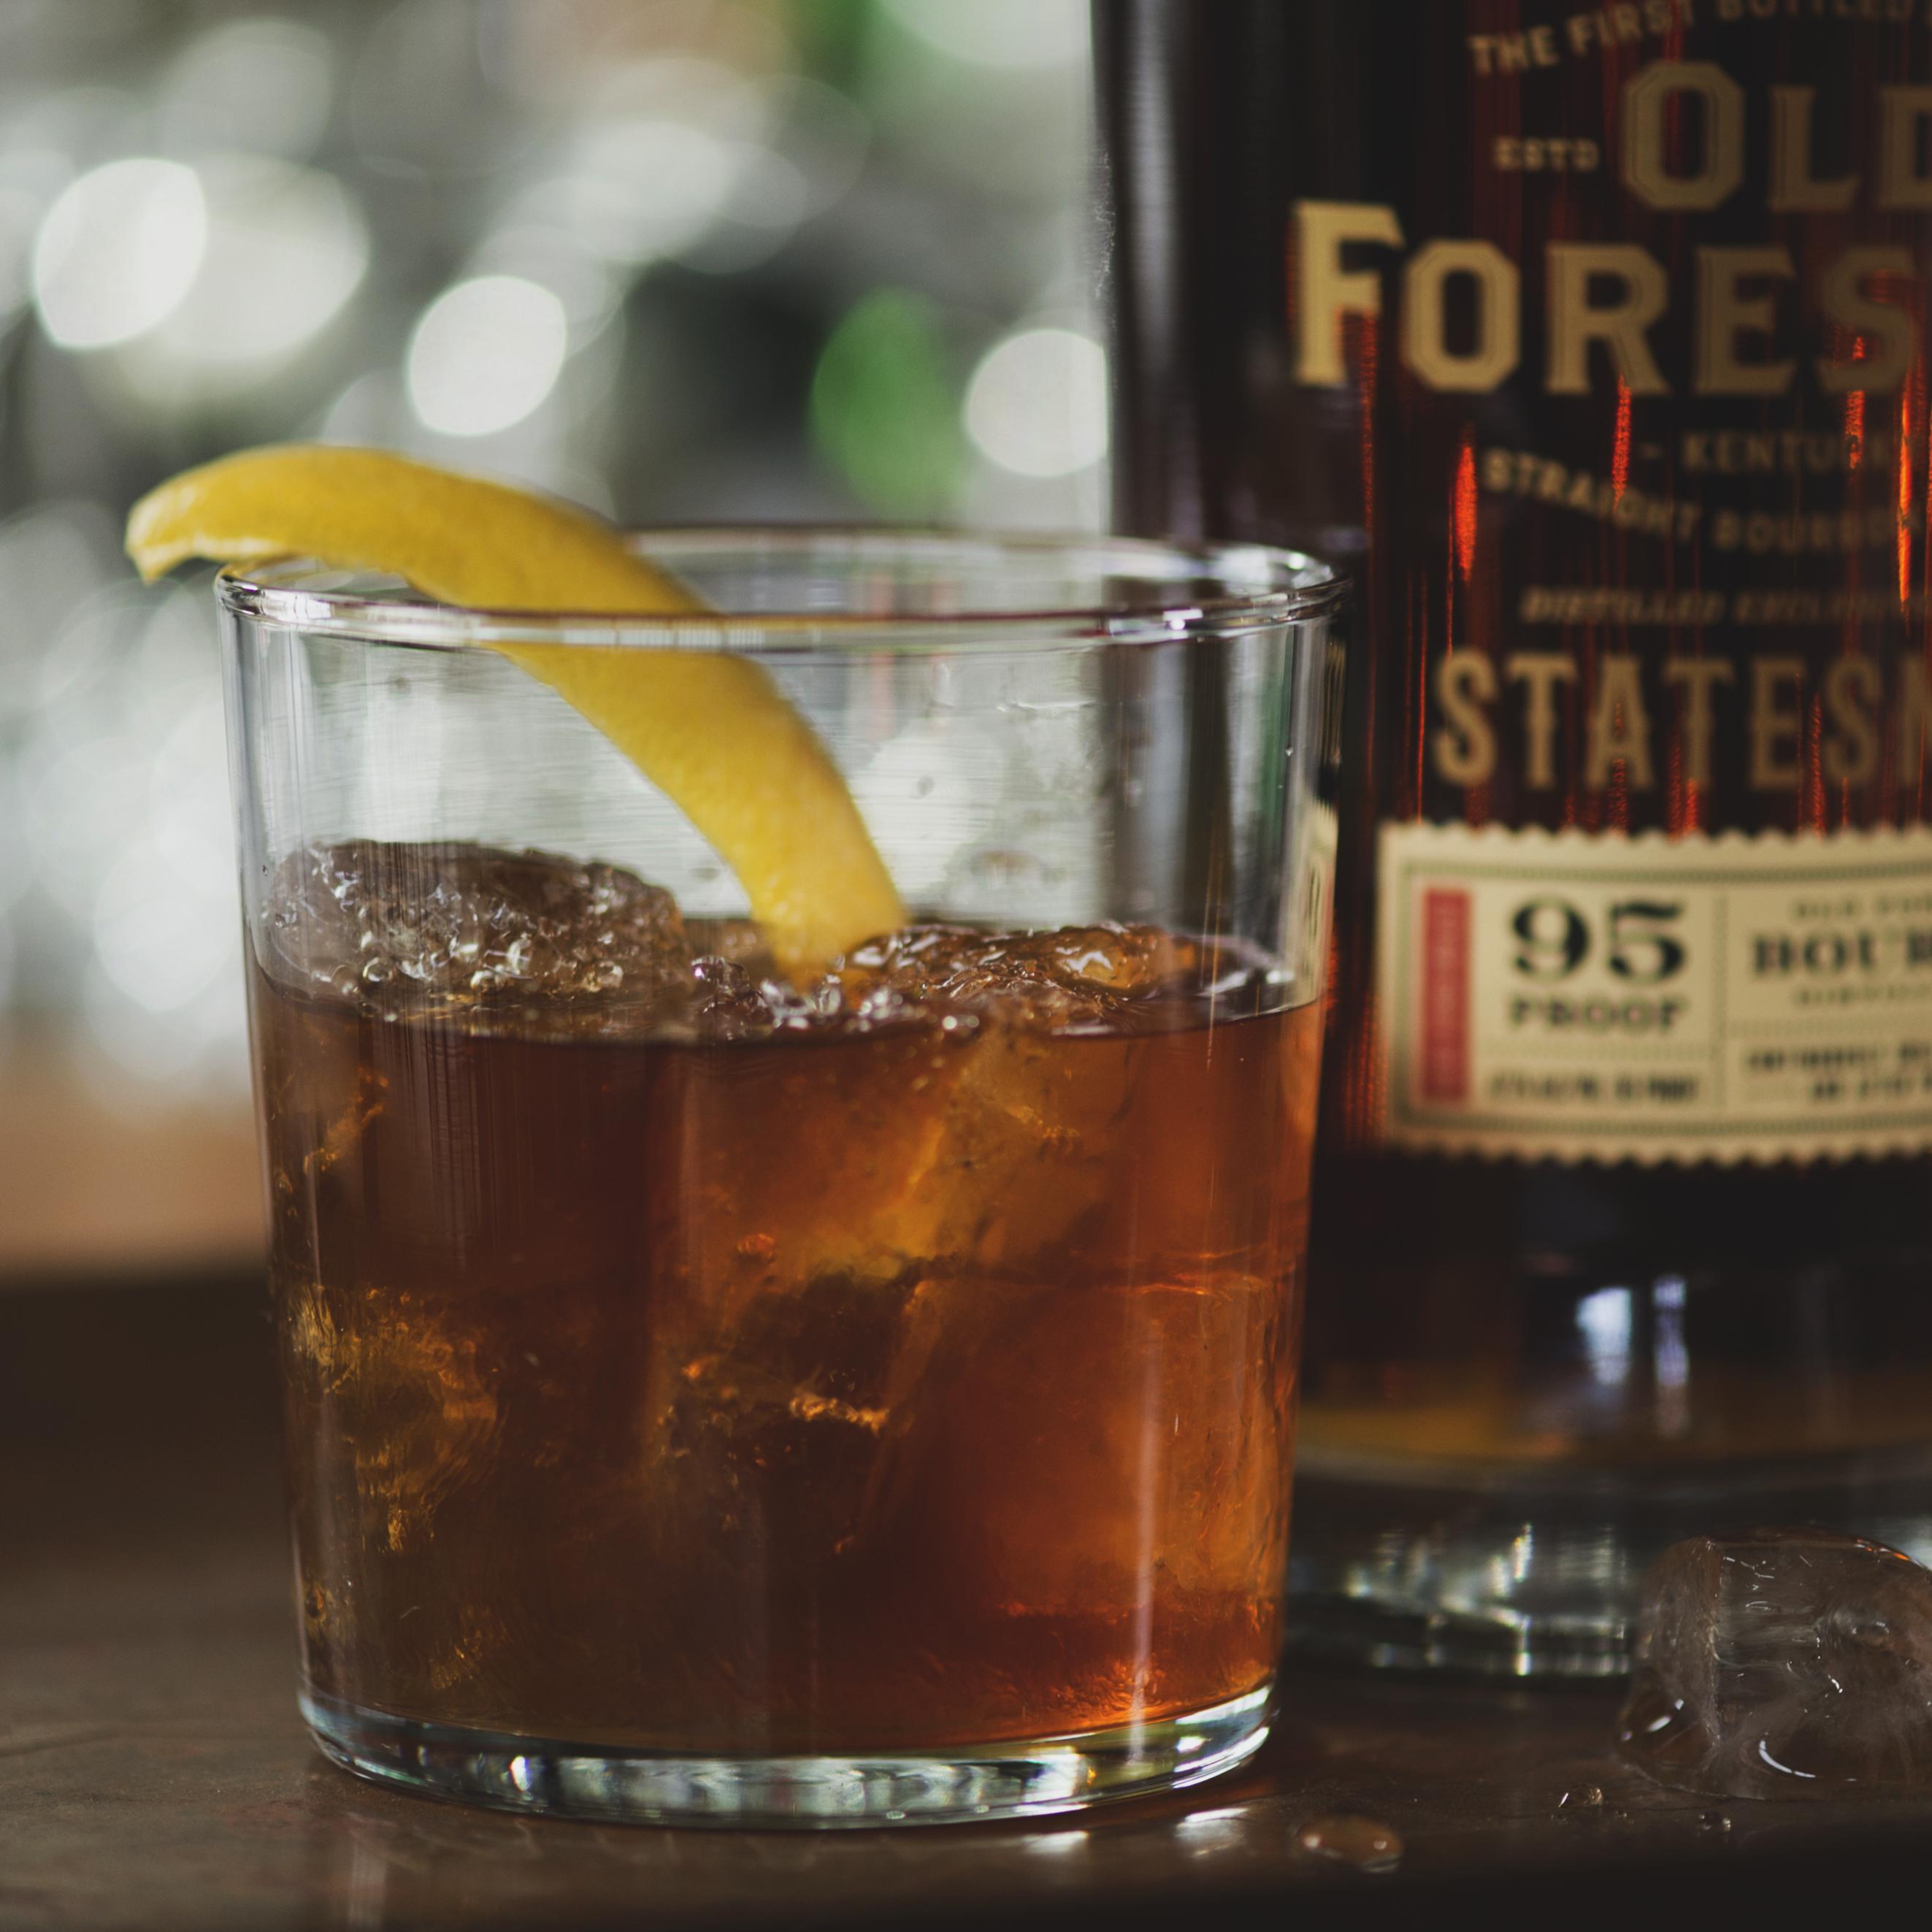 Statesman Cocktails